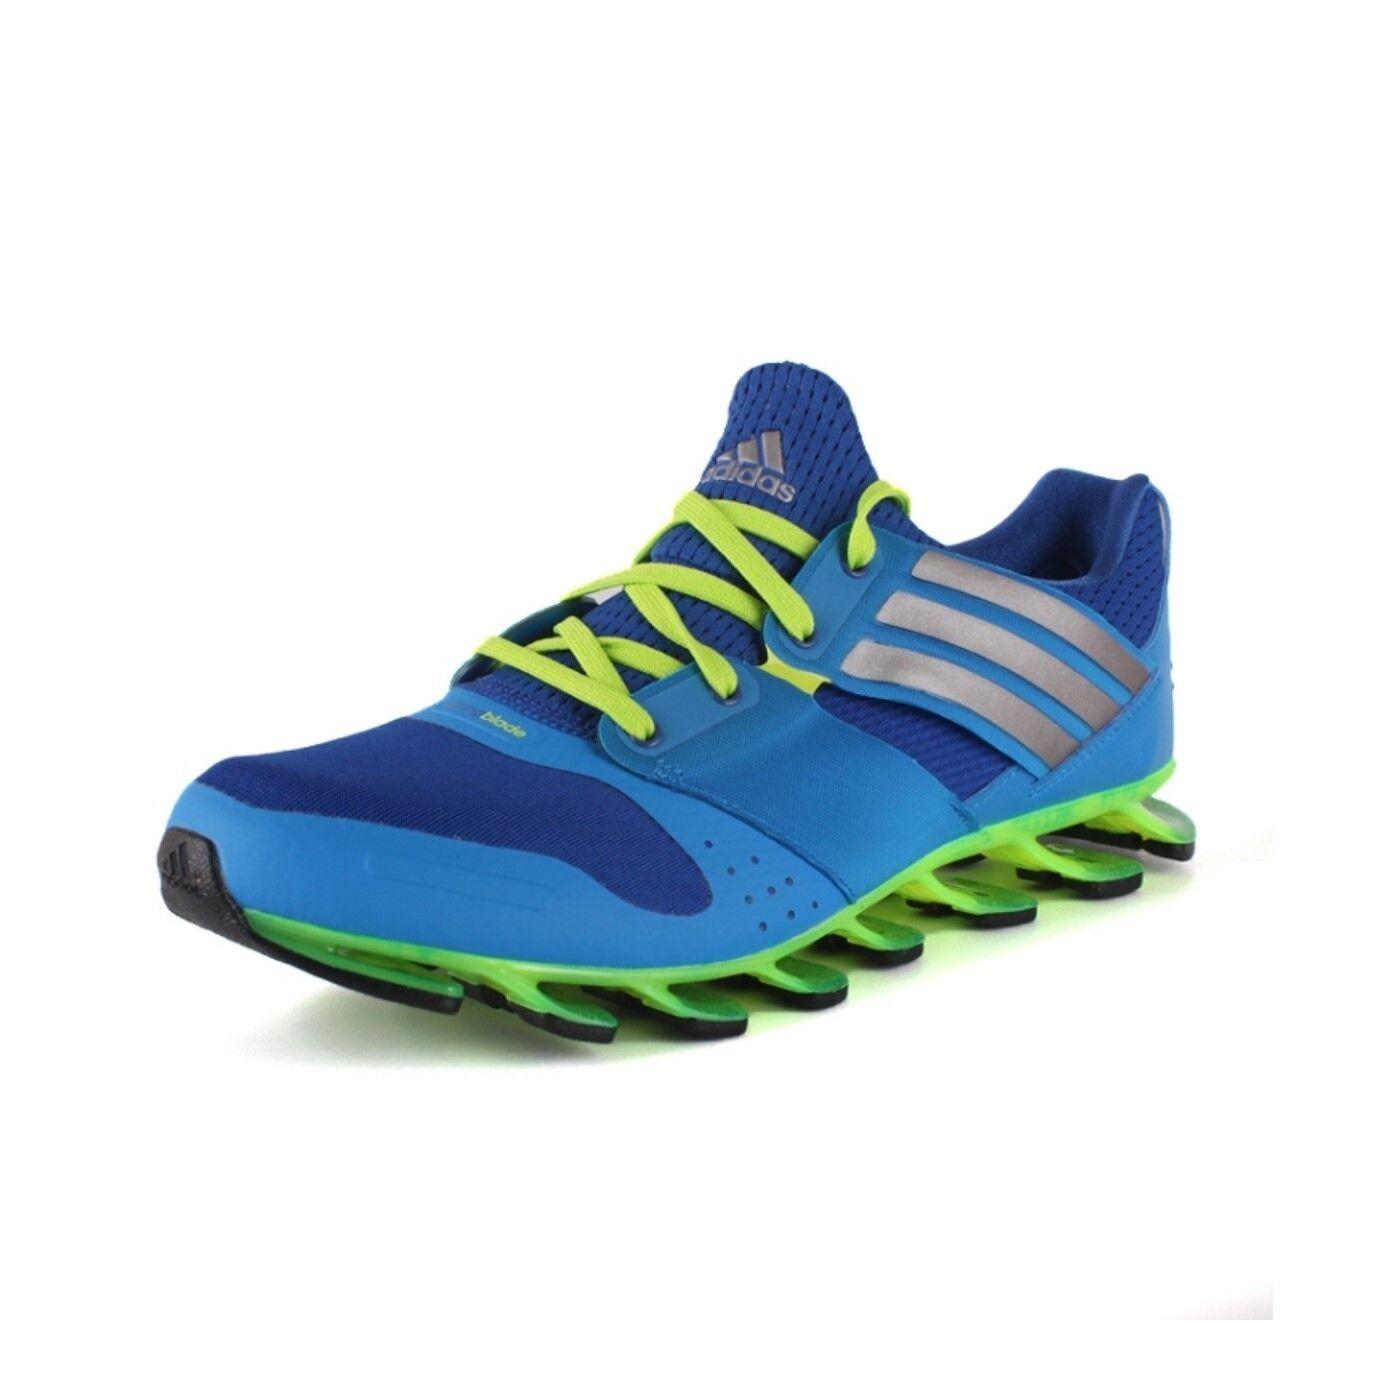 Adidas Spbagueblade Solyce hommes Laufschuh Joggingchaussures chaussures bleu